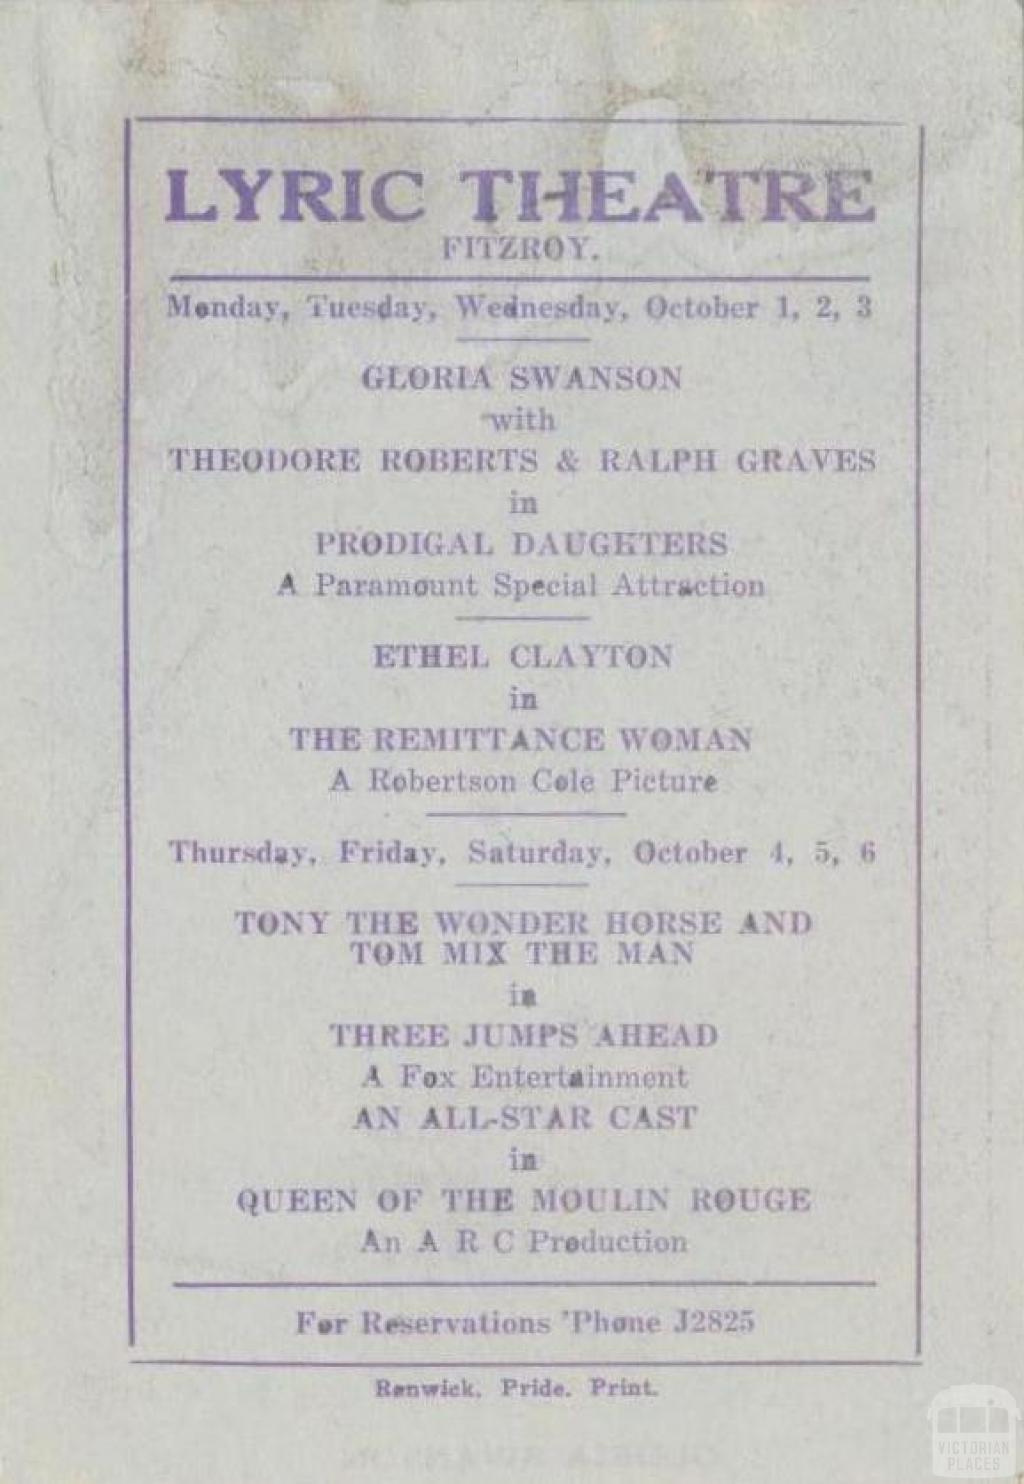 Lyric Theatre, Fitzroy